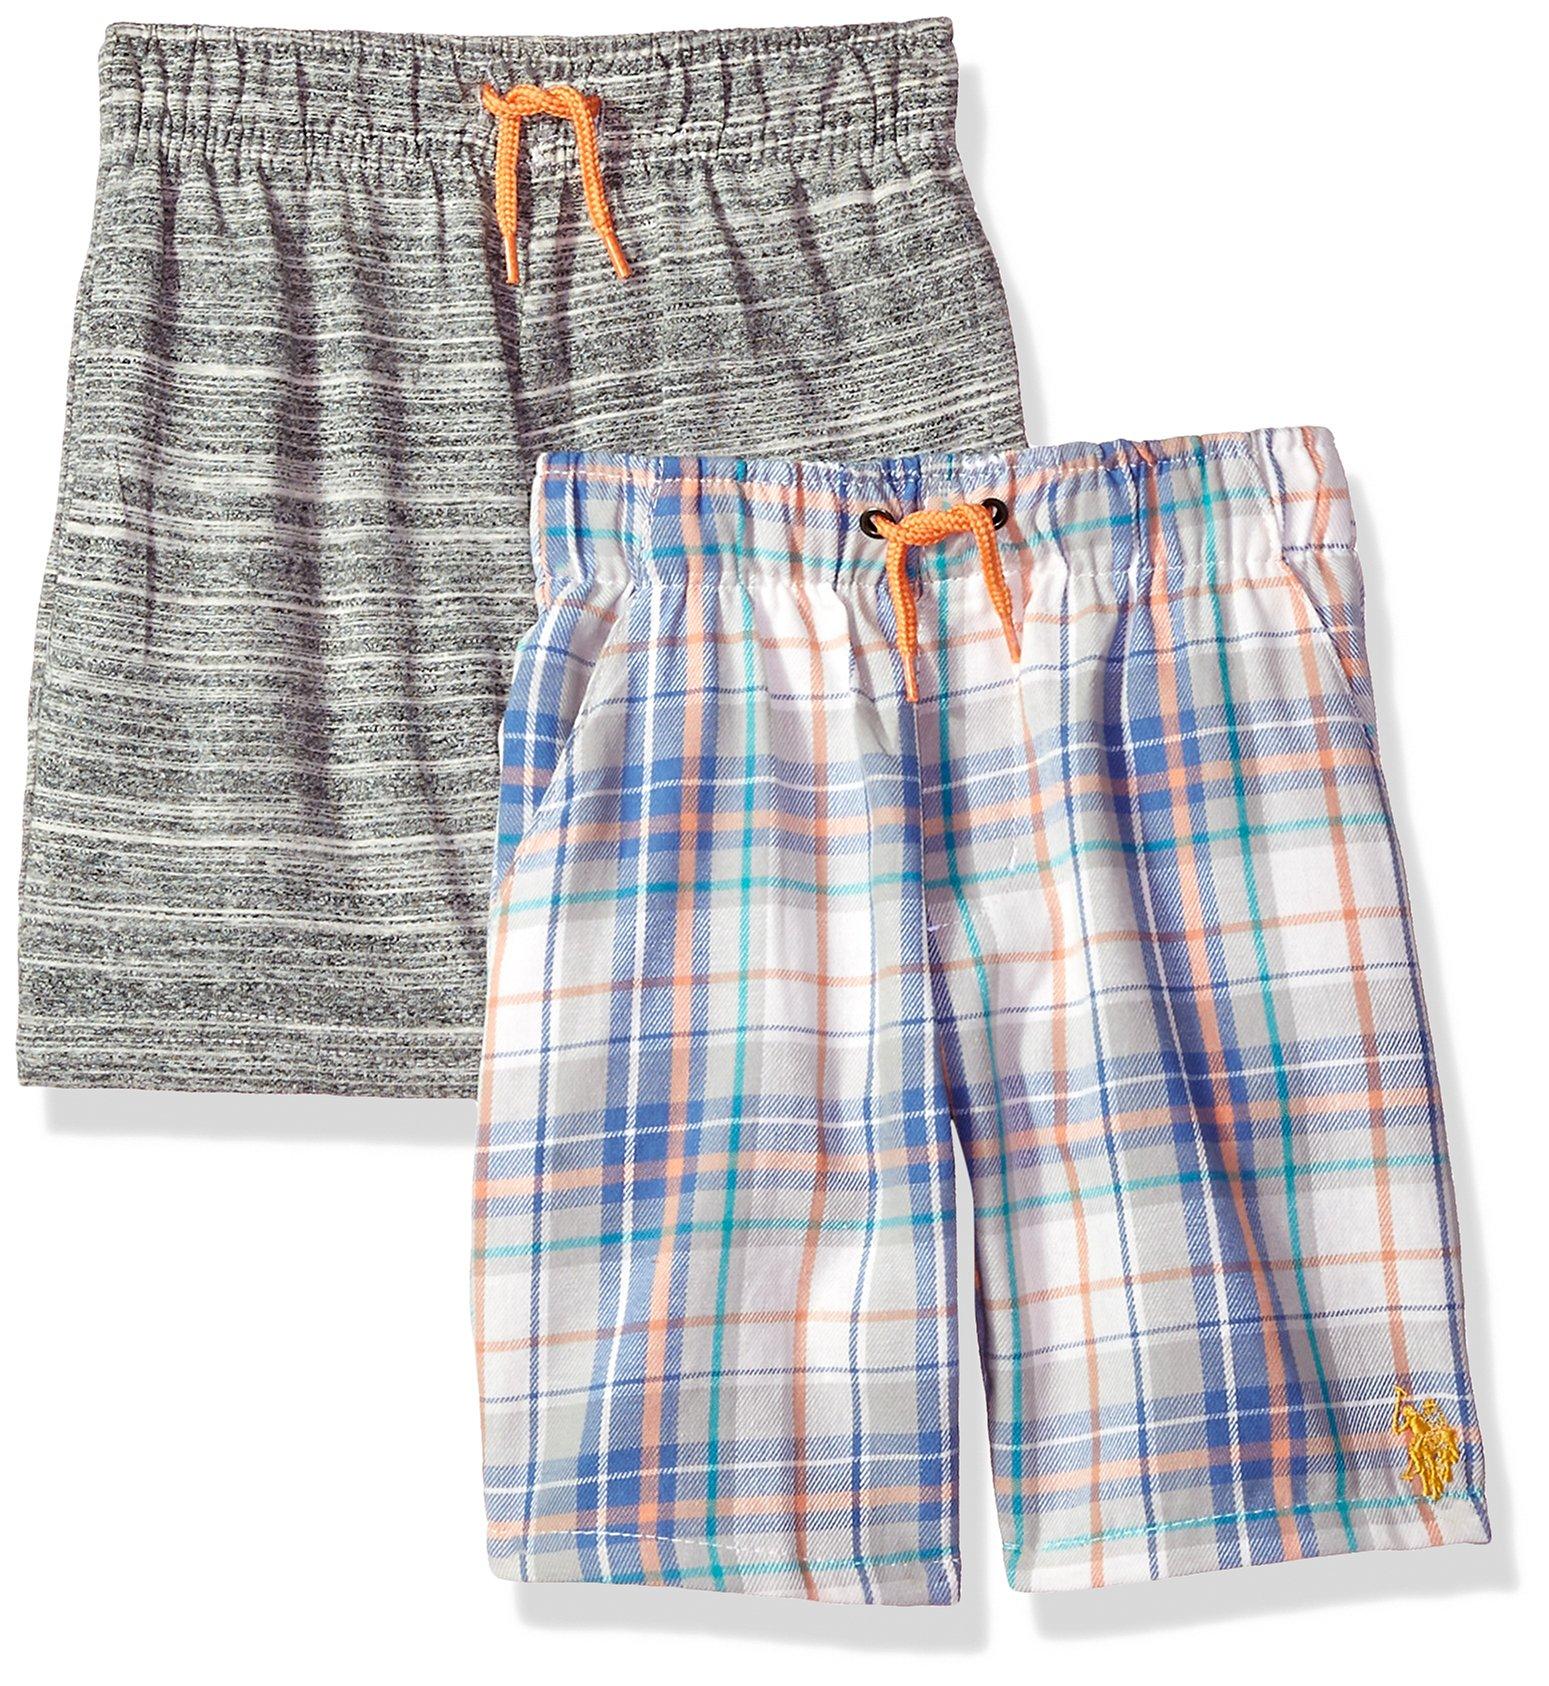 U.S. Polo Assn.. Toddler Boys' 2 Pack Short, Peach Pop Multi Plaid, 4T